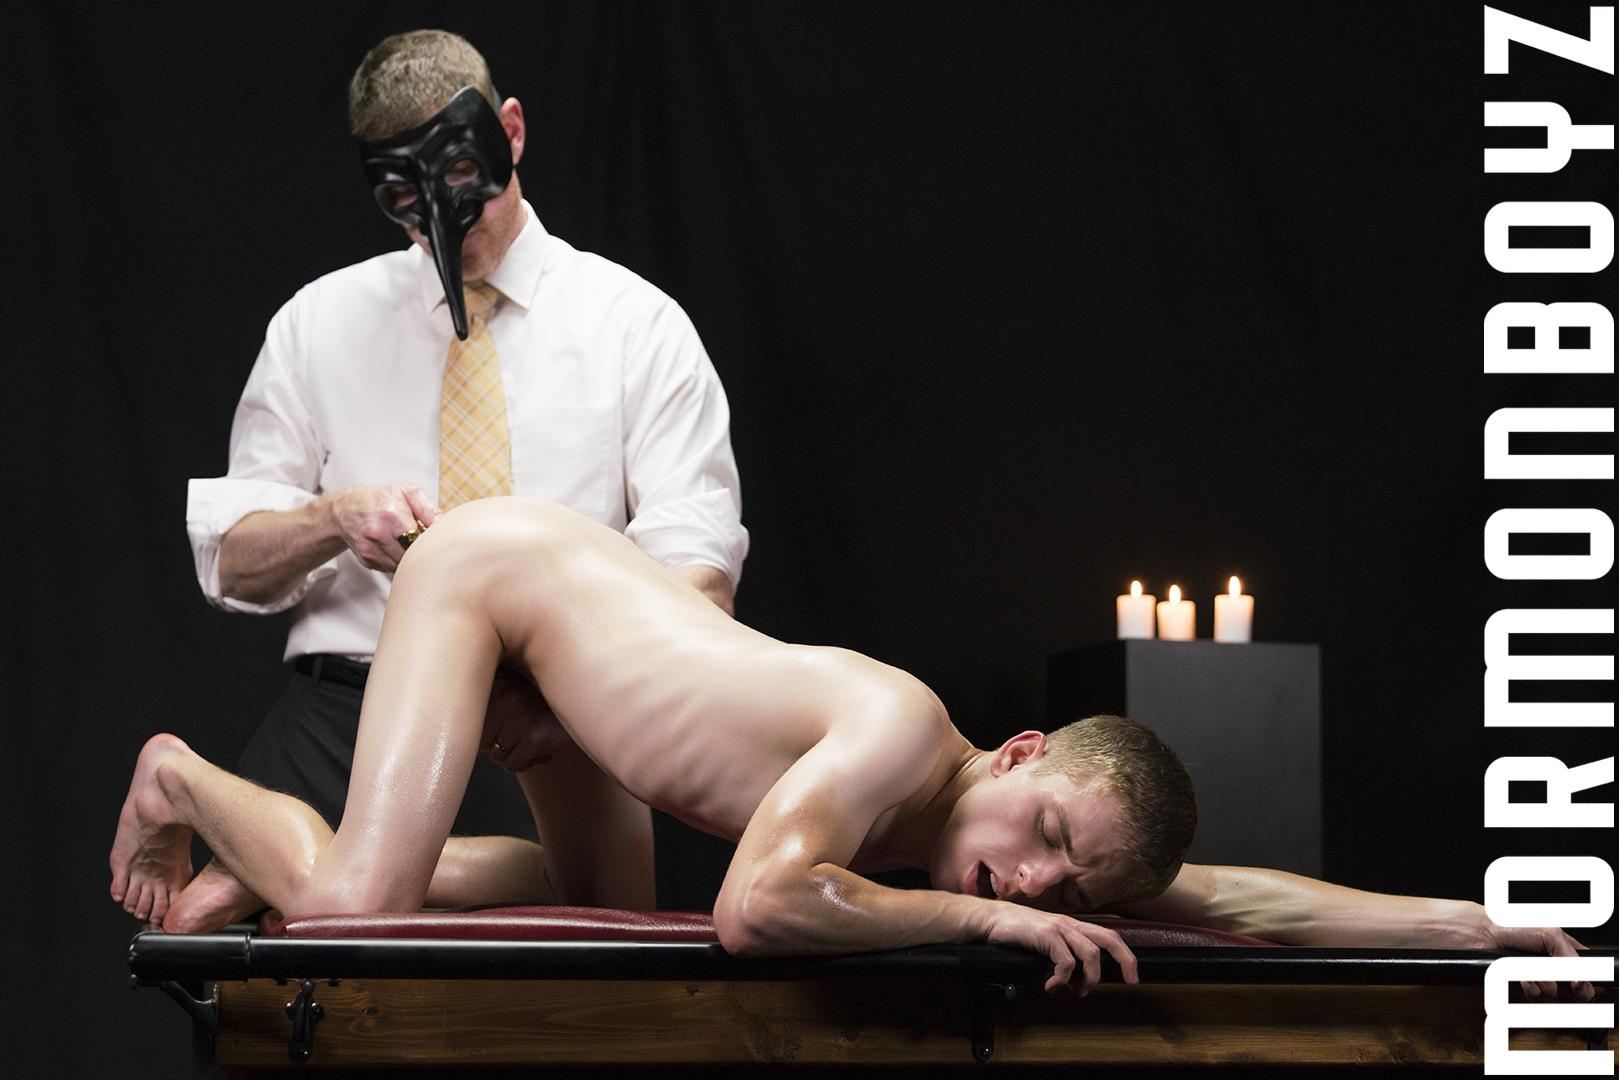 170820_mbz_07-mormonboyz-gay-daddy-son-sex_pic18